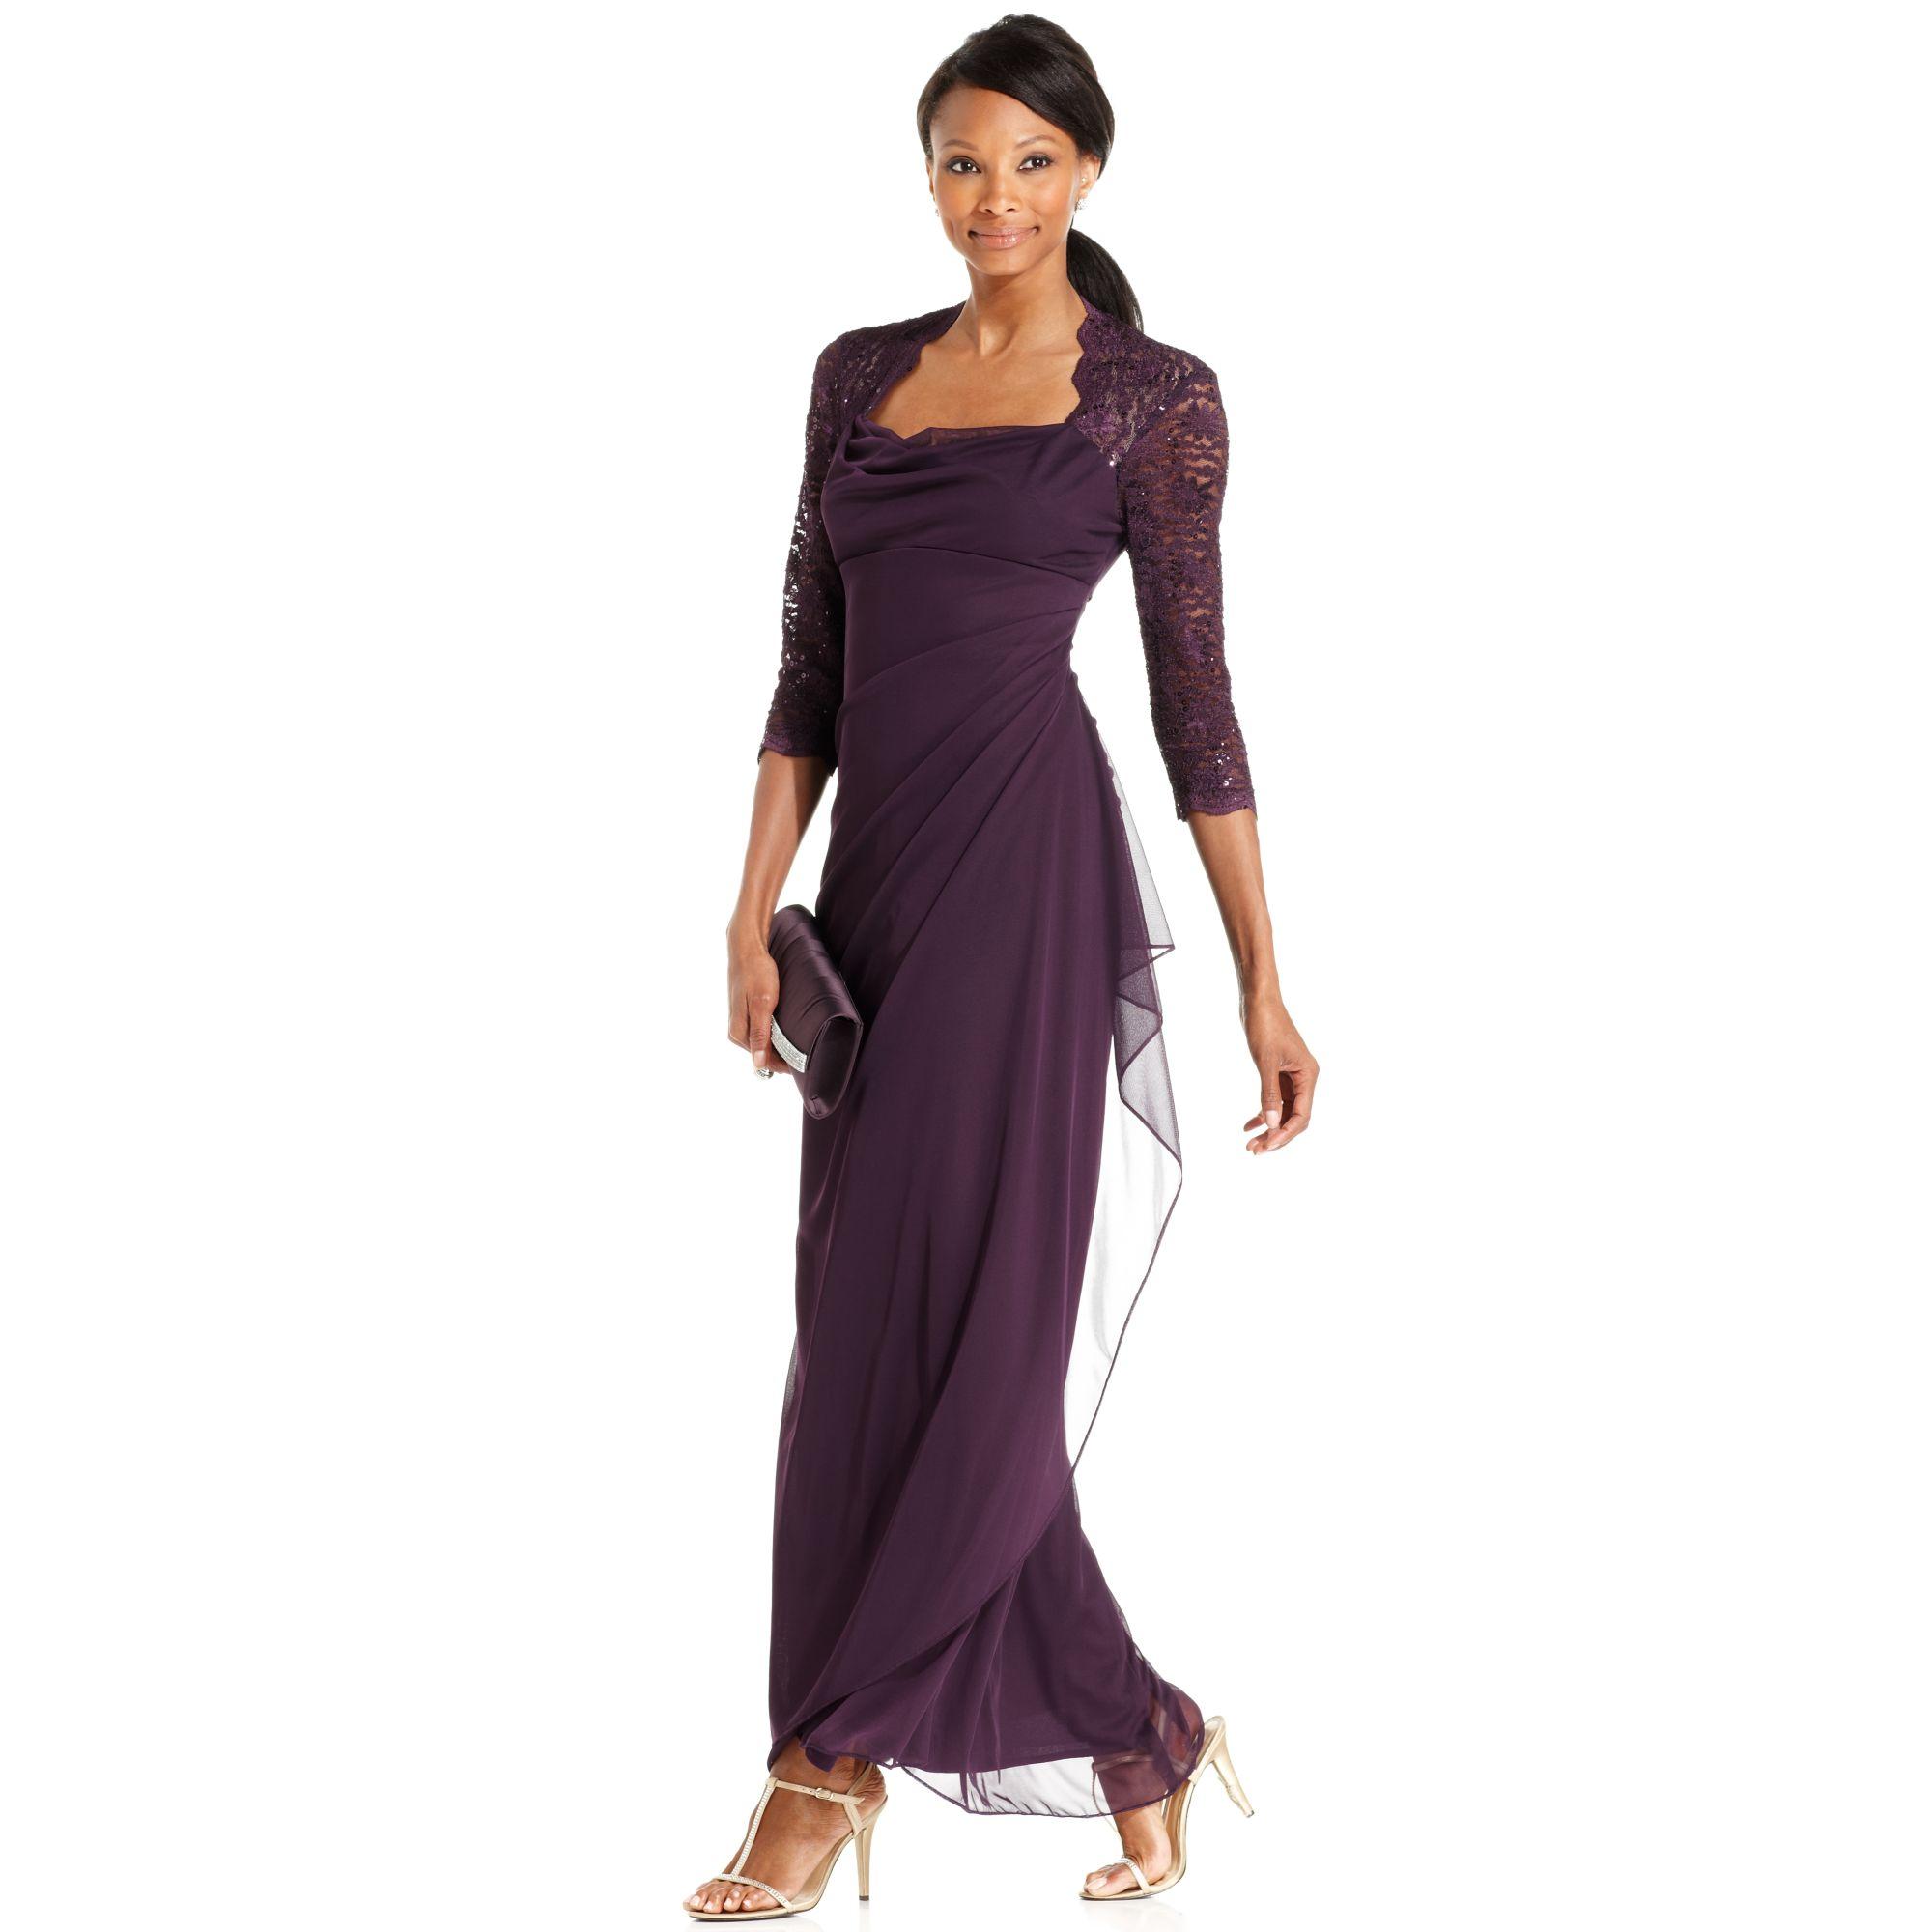 Xscape Xscape Petite Dress Threequartersleeve Sequin Lace Draped Gown ...